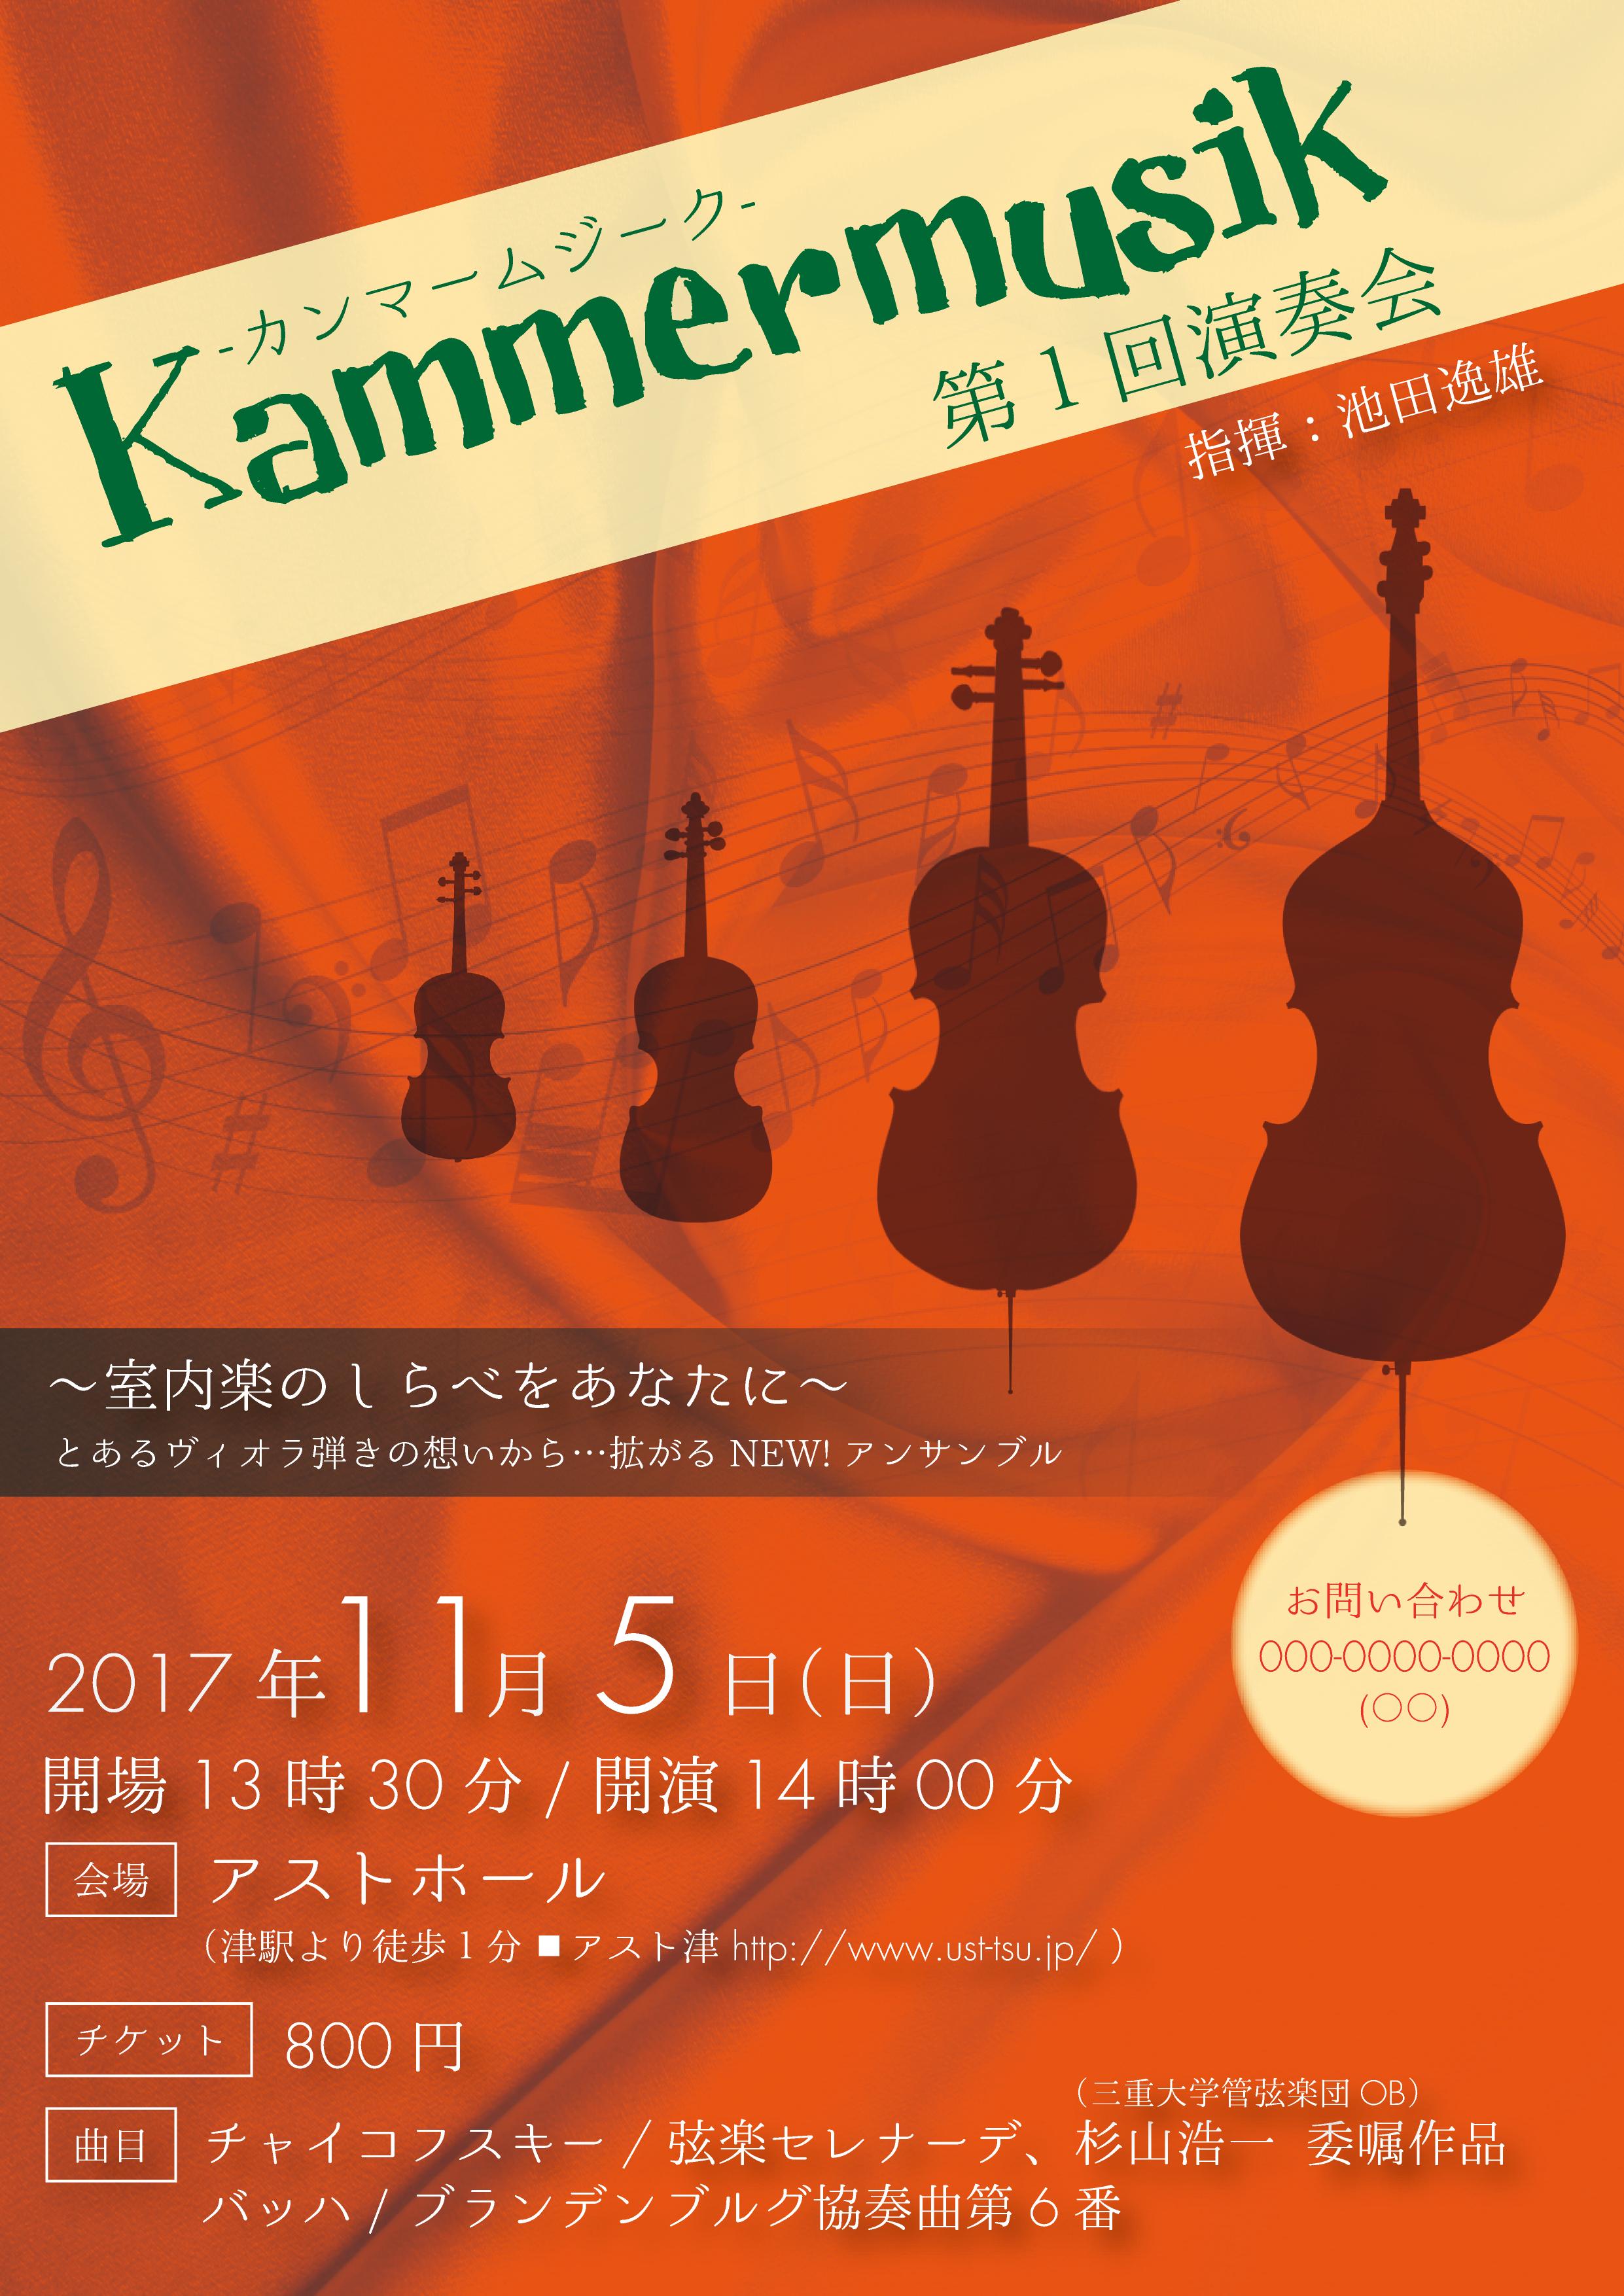 Kammermusik-Concert VOL.1 Pattern3-2017.09.22⑤(最終版)